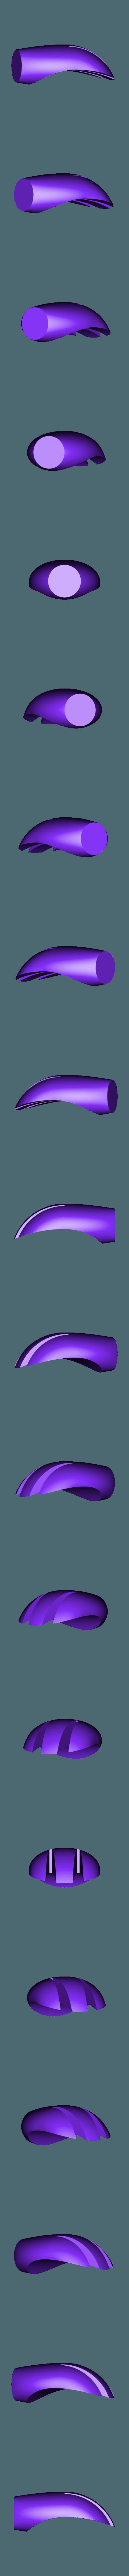 Hand_2X.STL Download STL file Grimlock • Model to 3D print, biglildesign